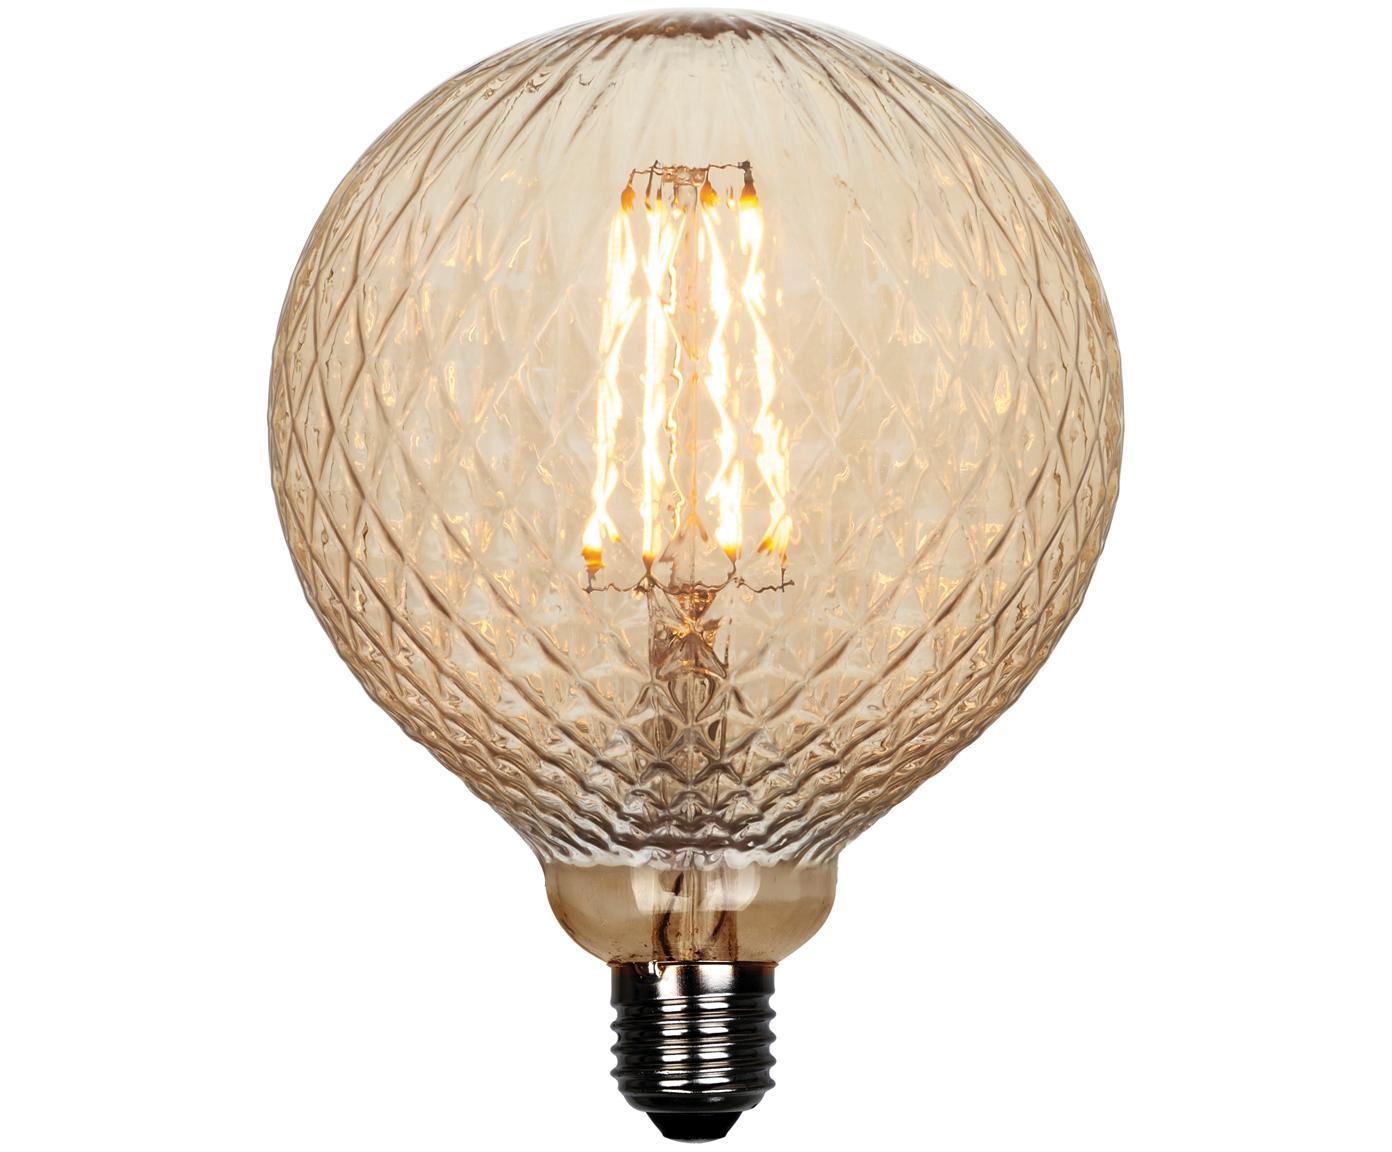 XL LED Leuchtmittel Facet (E27/2W), Leuchtmittelschirm: Glas, Leuchtmittelfassung: Aluminium, Beige, Aluminium, Ø 13 x H 19 cm